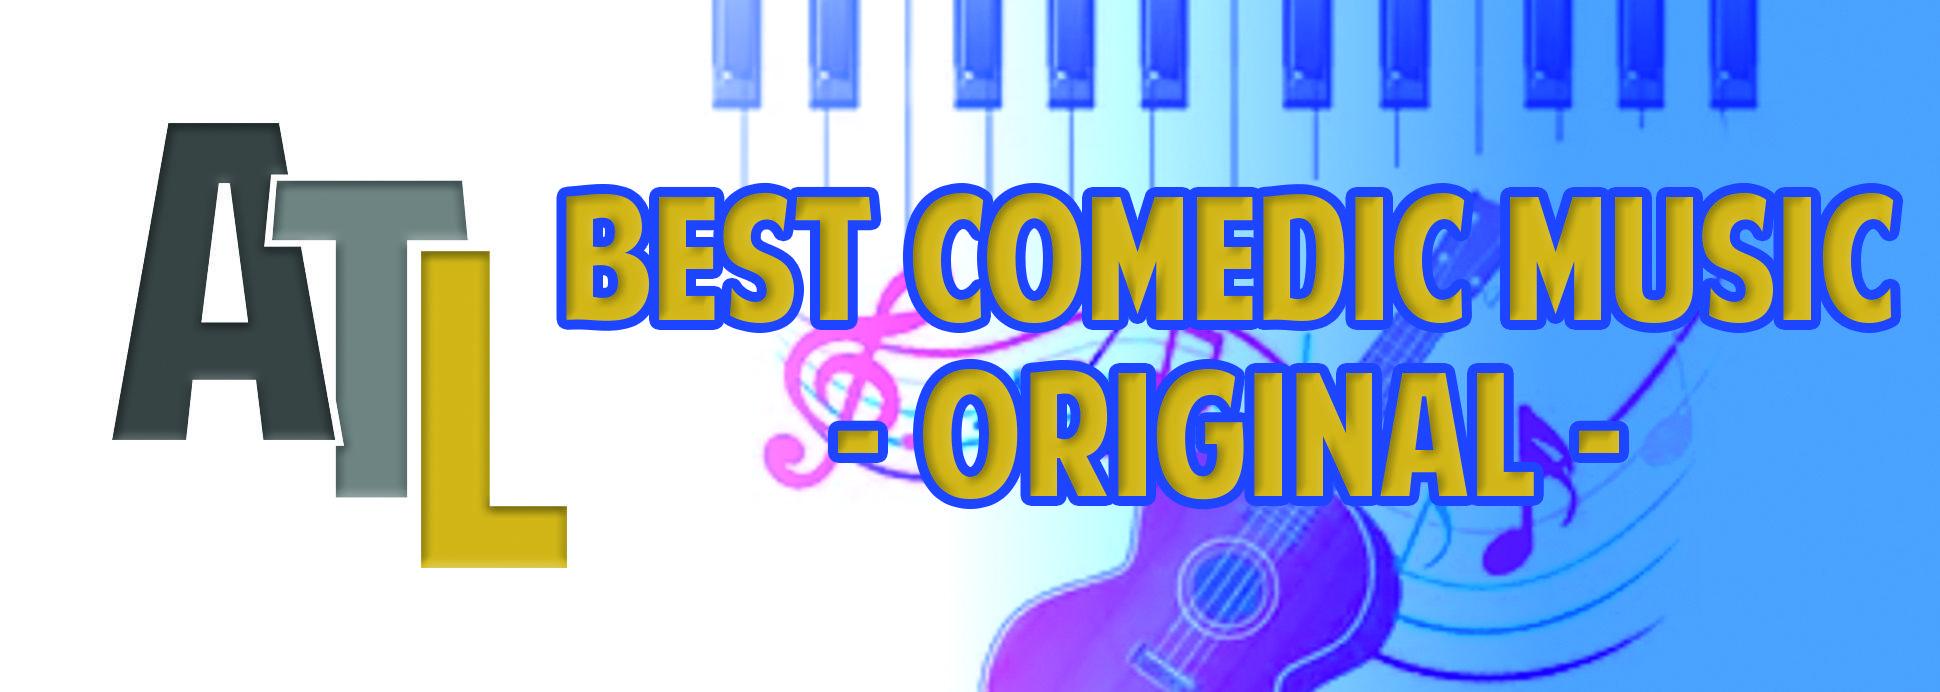 Best Comedic Music - Original